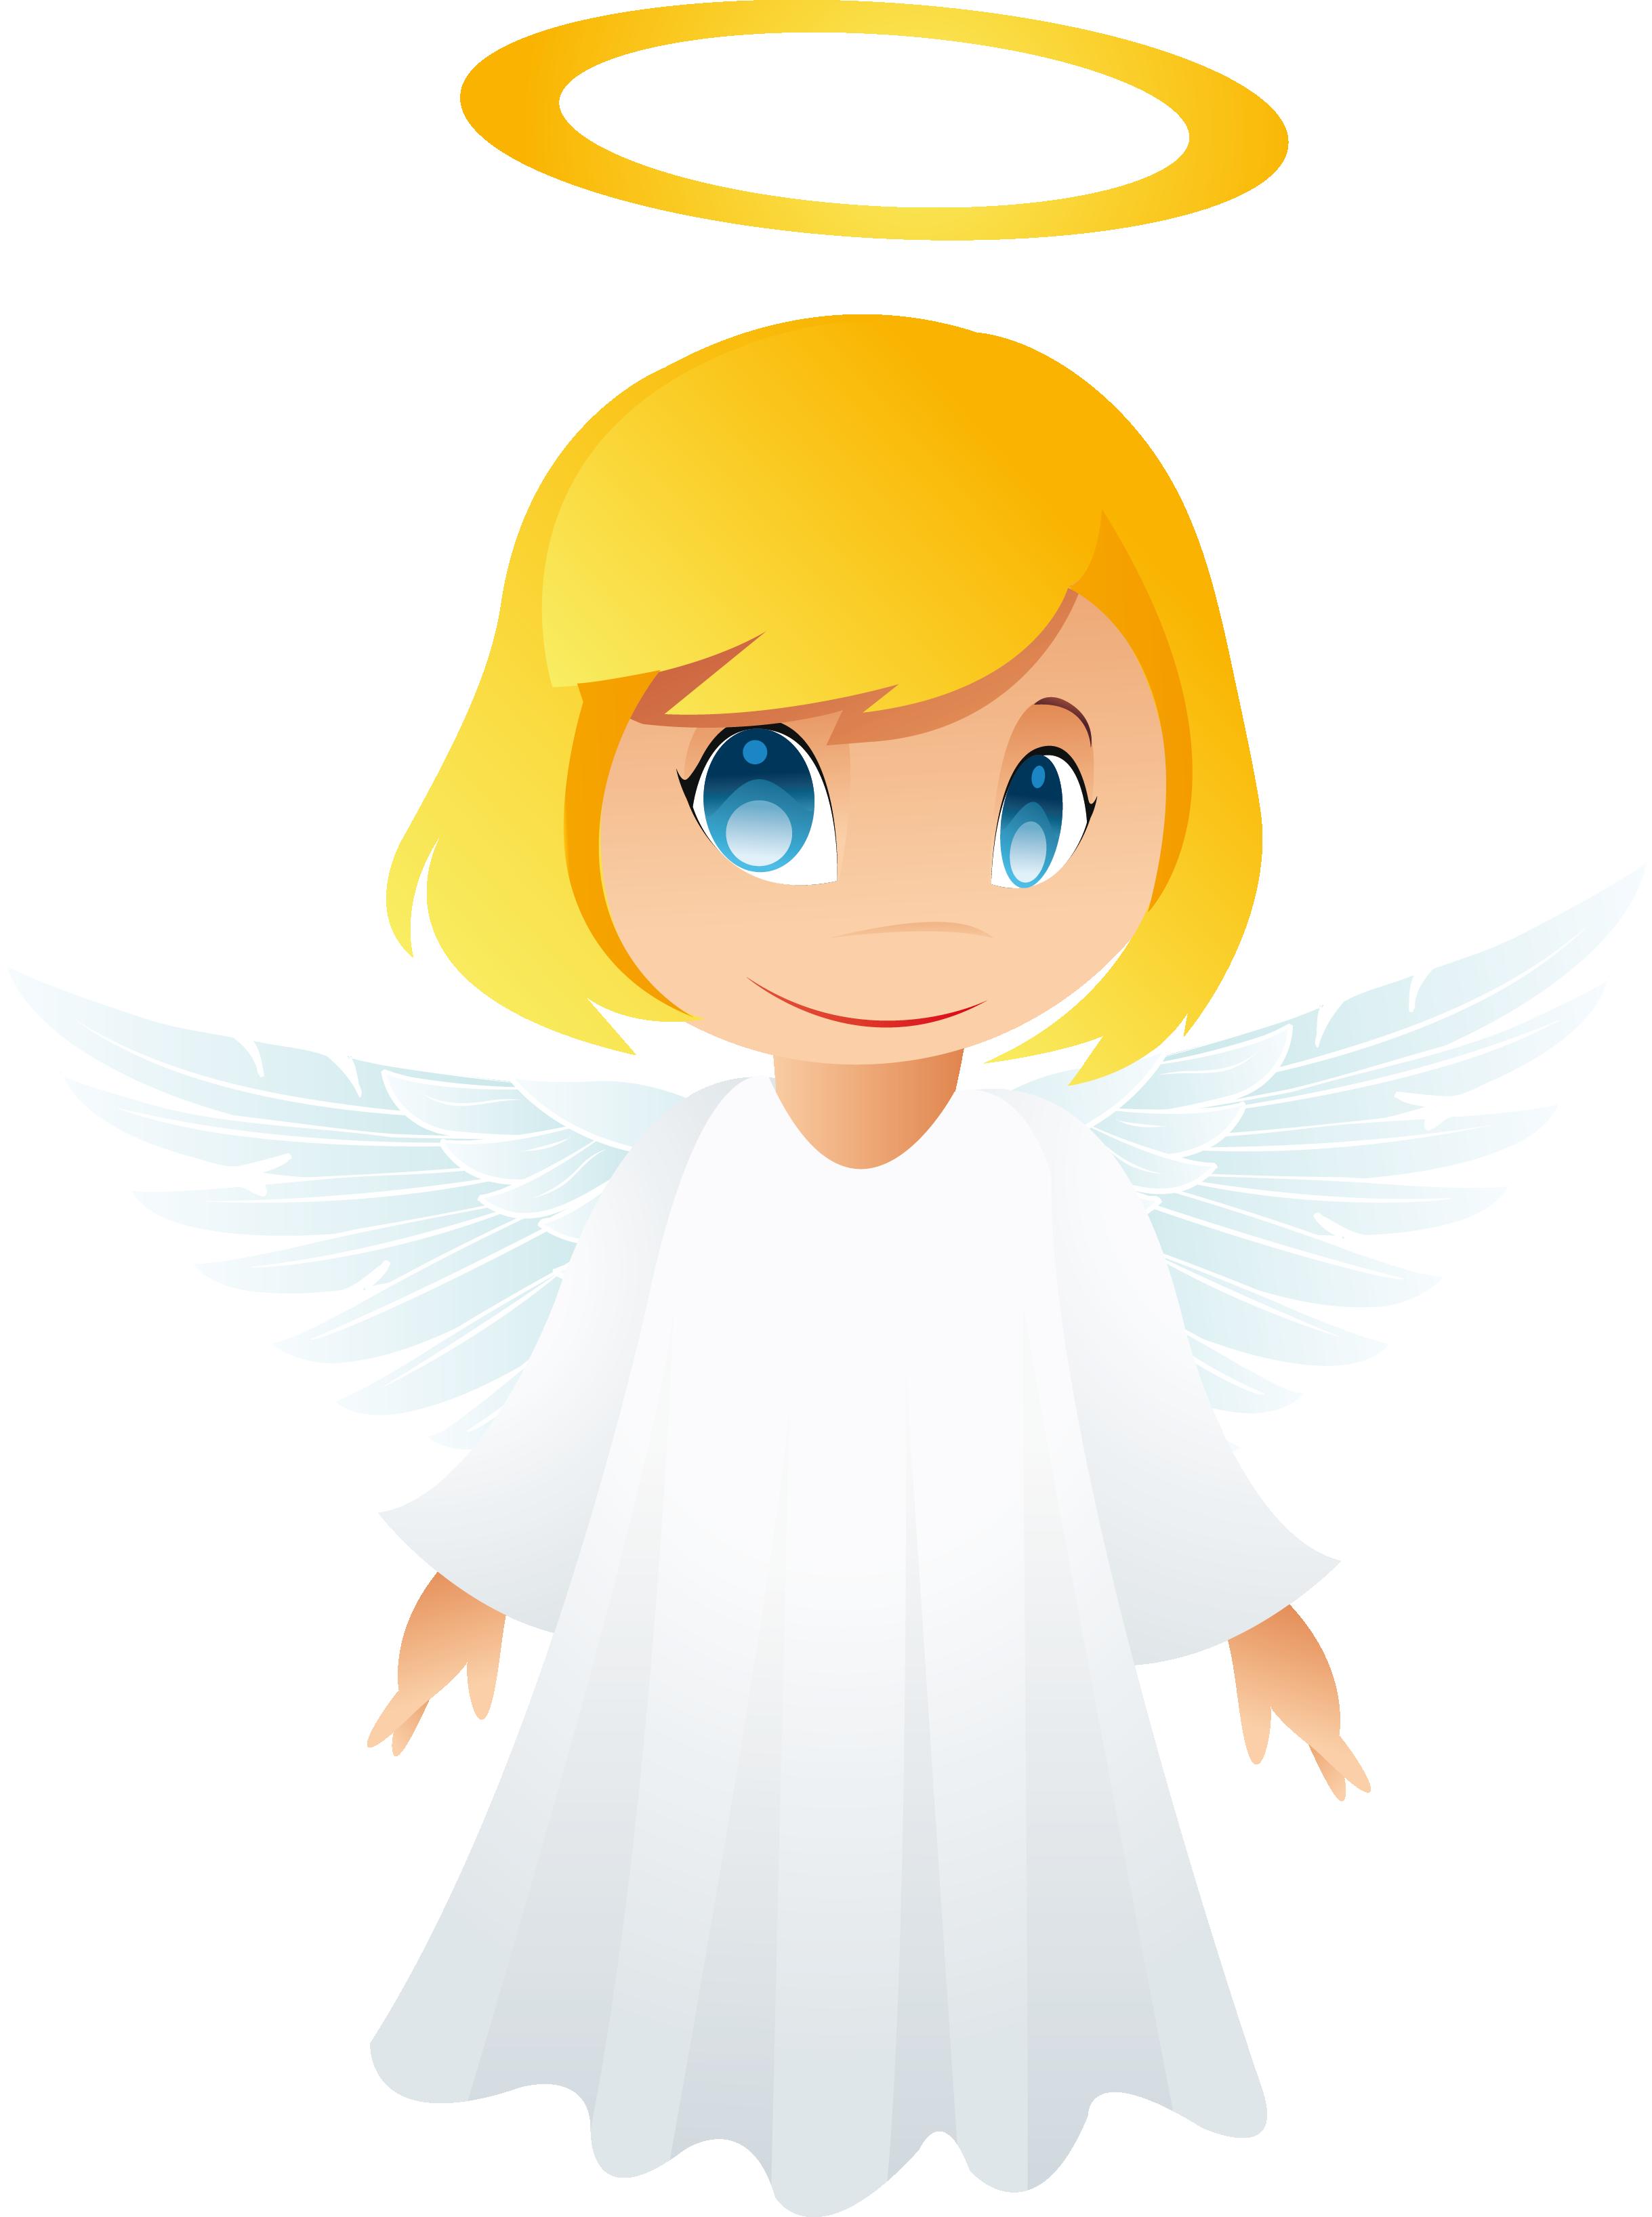 Angel clipart free graphics of cherubs a-Angel clipart free graphics of cherubs and angels the cliparts-2